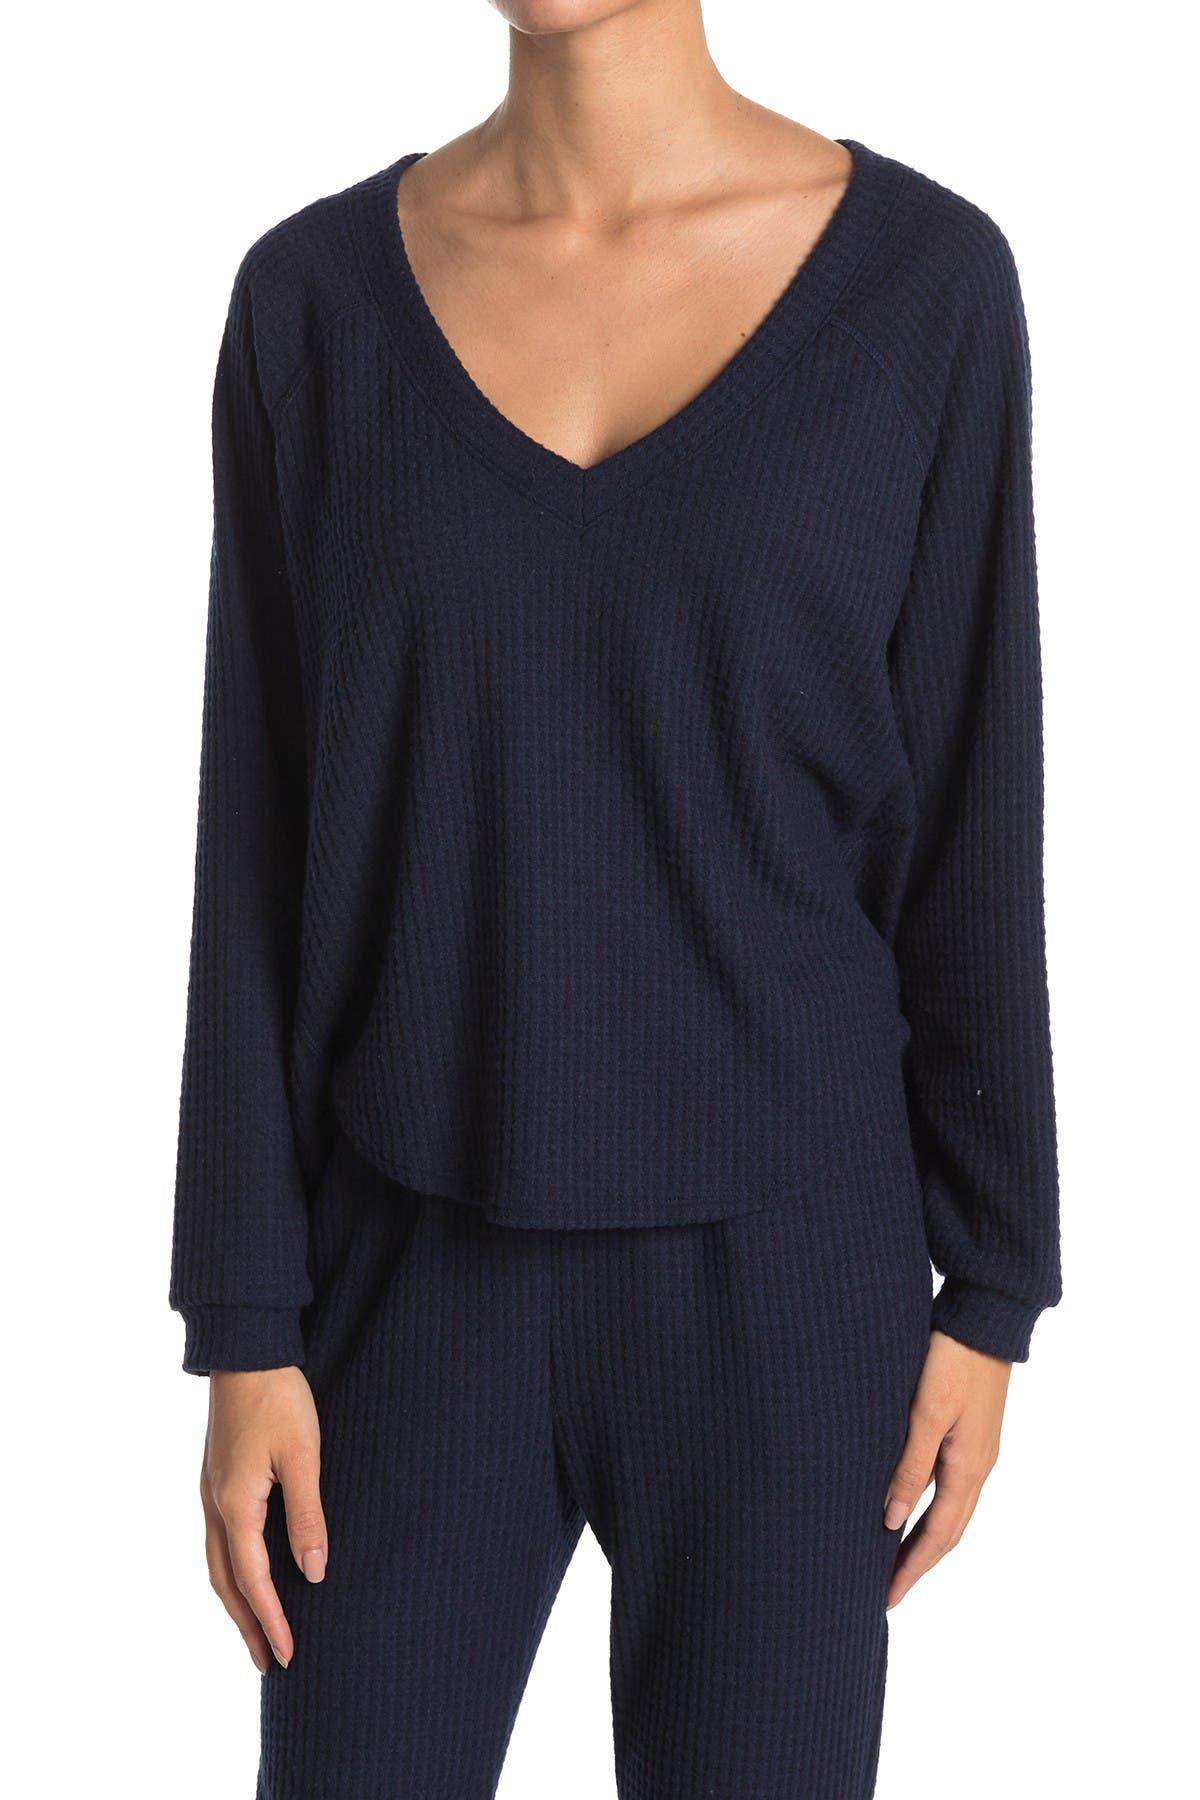 Image of Socialite V-Neck Long Sleeve Brushed Knit Lounge Top